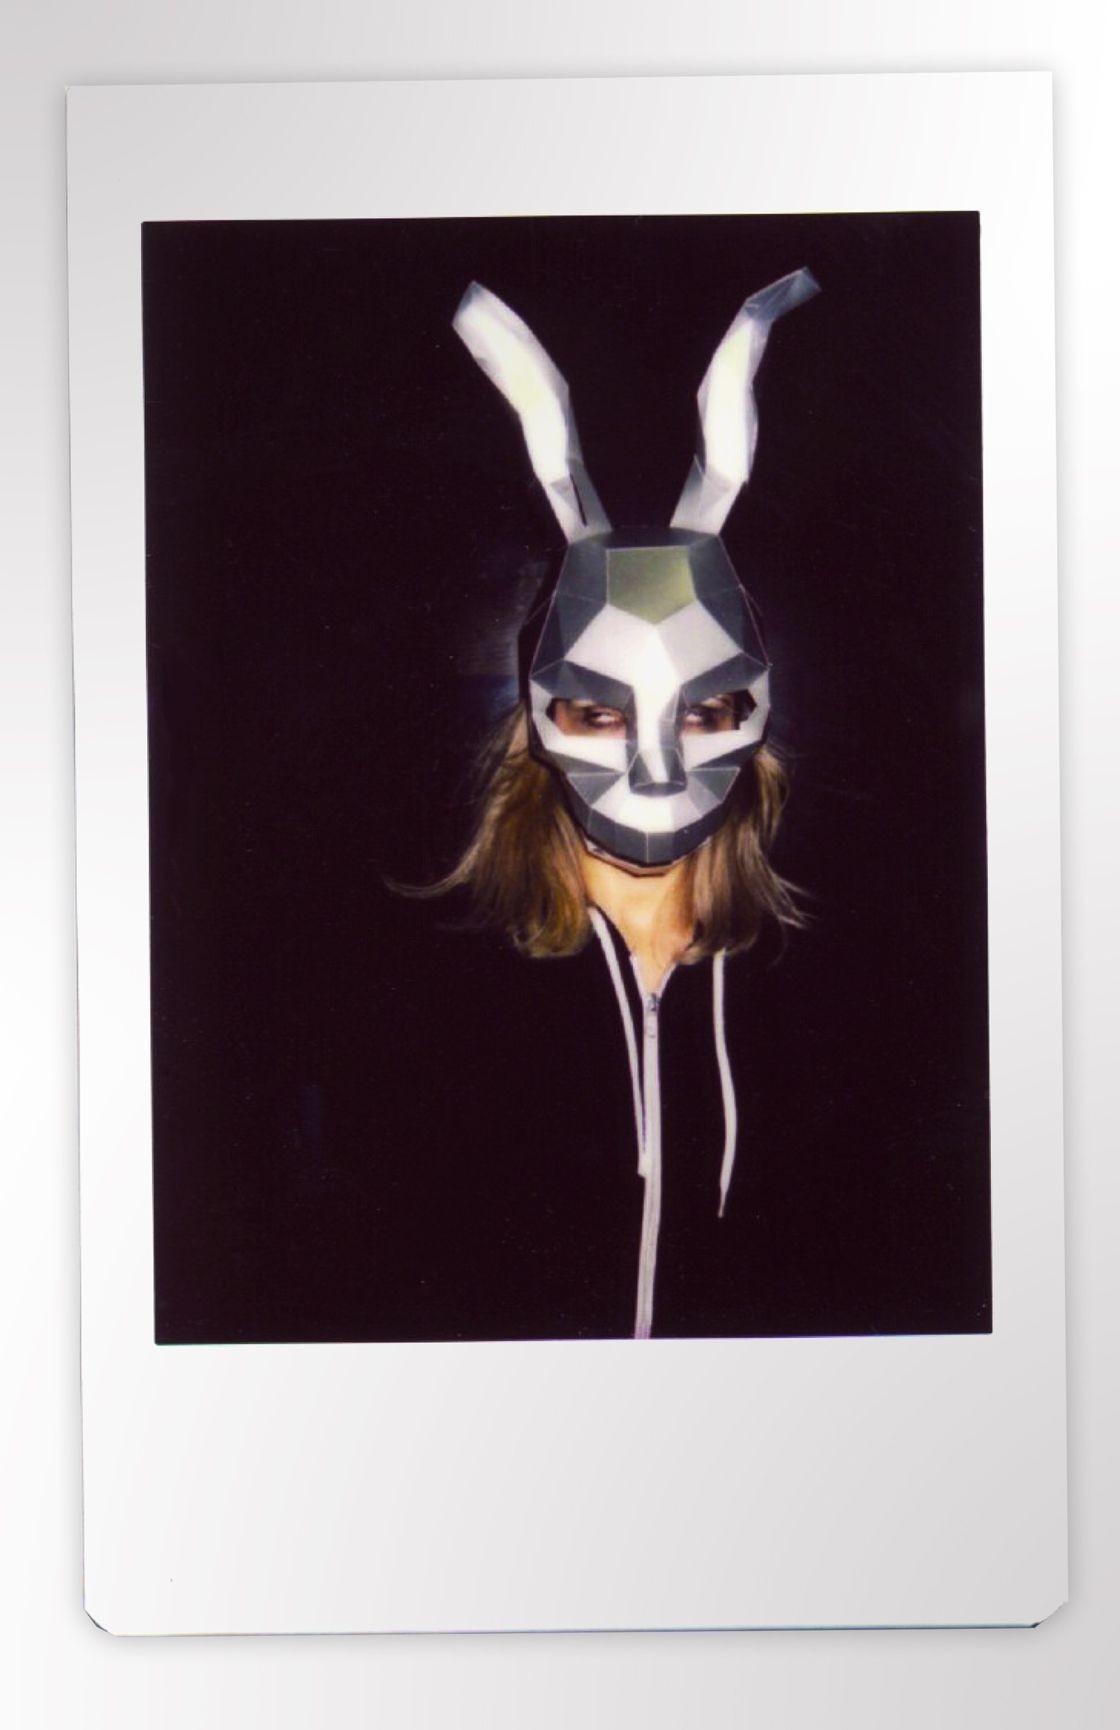 Halloween Papercraft Frank Rabbit Mask Donnie Darko Mask Hare Mask Diy 3dmask Pdf Paper